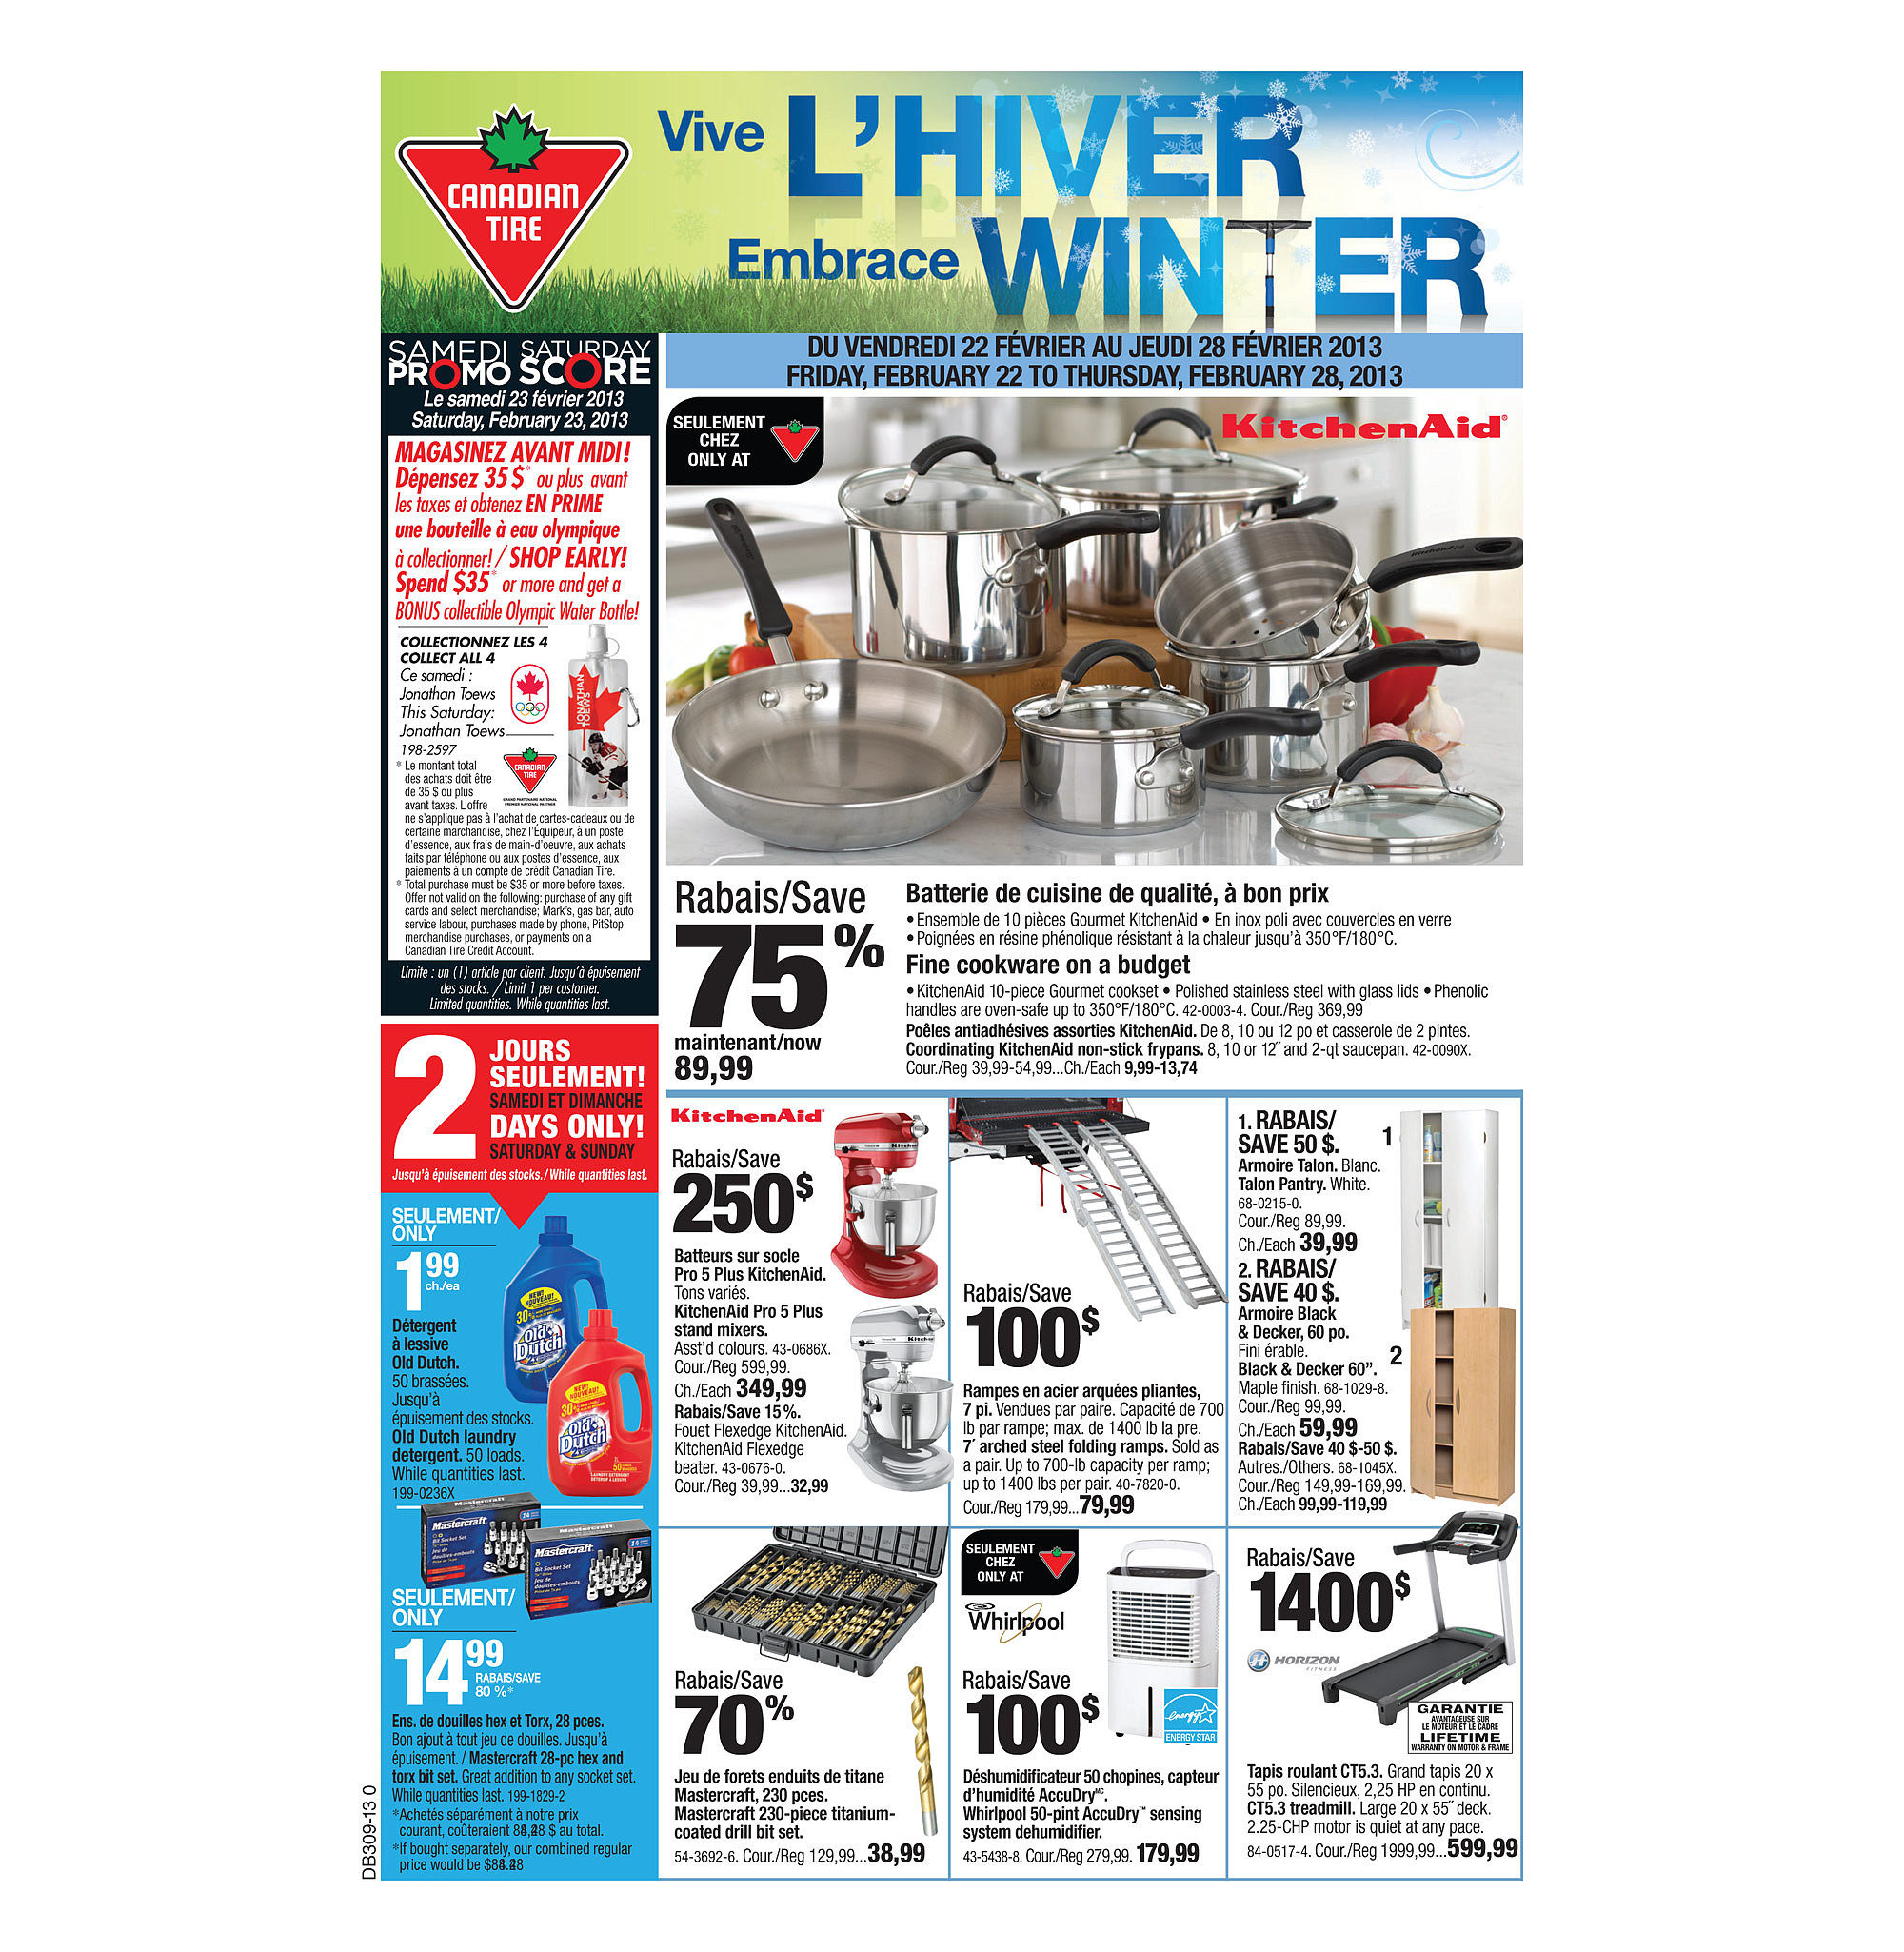 Canadian Tire Weekly Flyer Weekly Flyer Feb 21 28